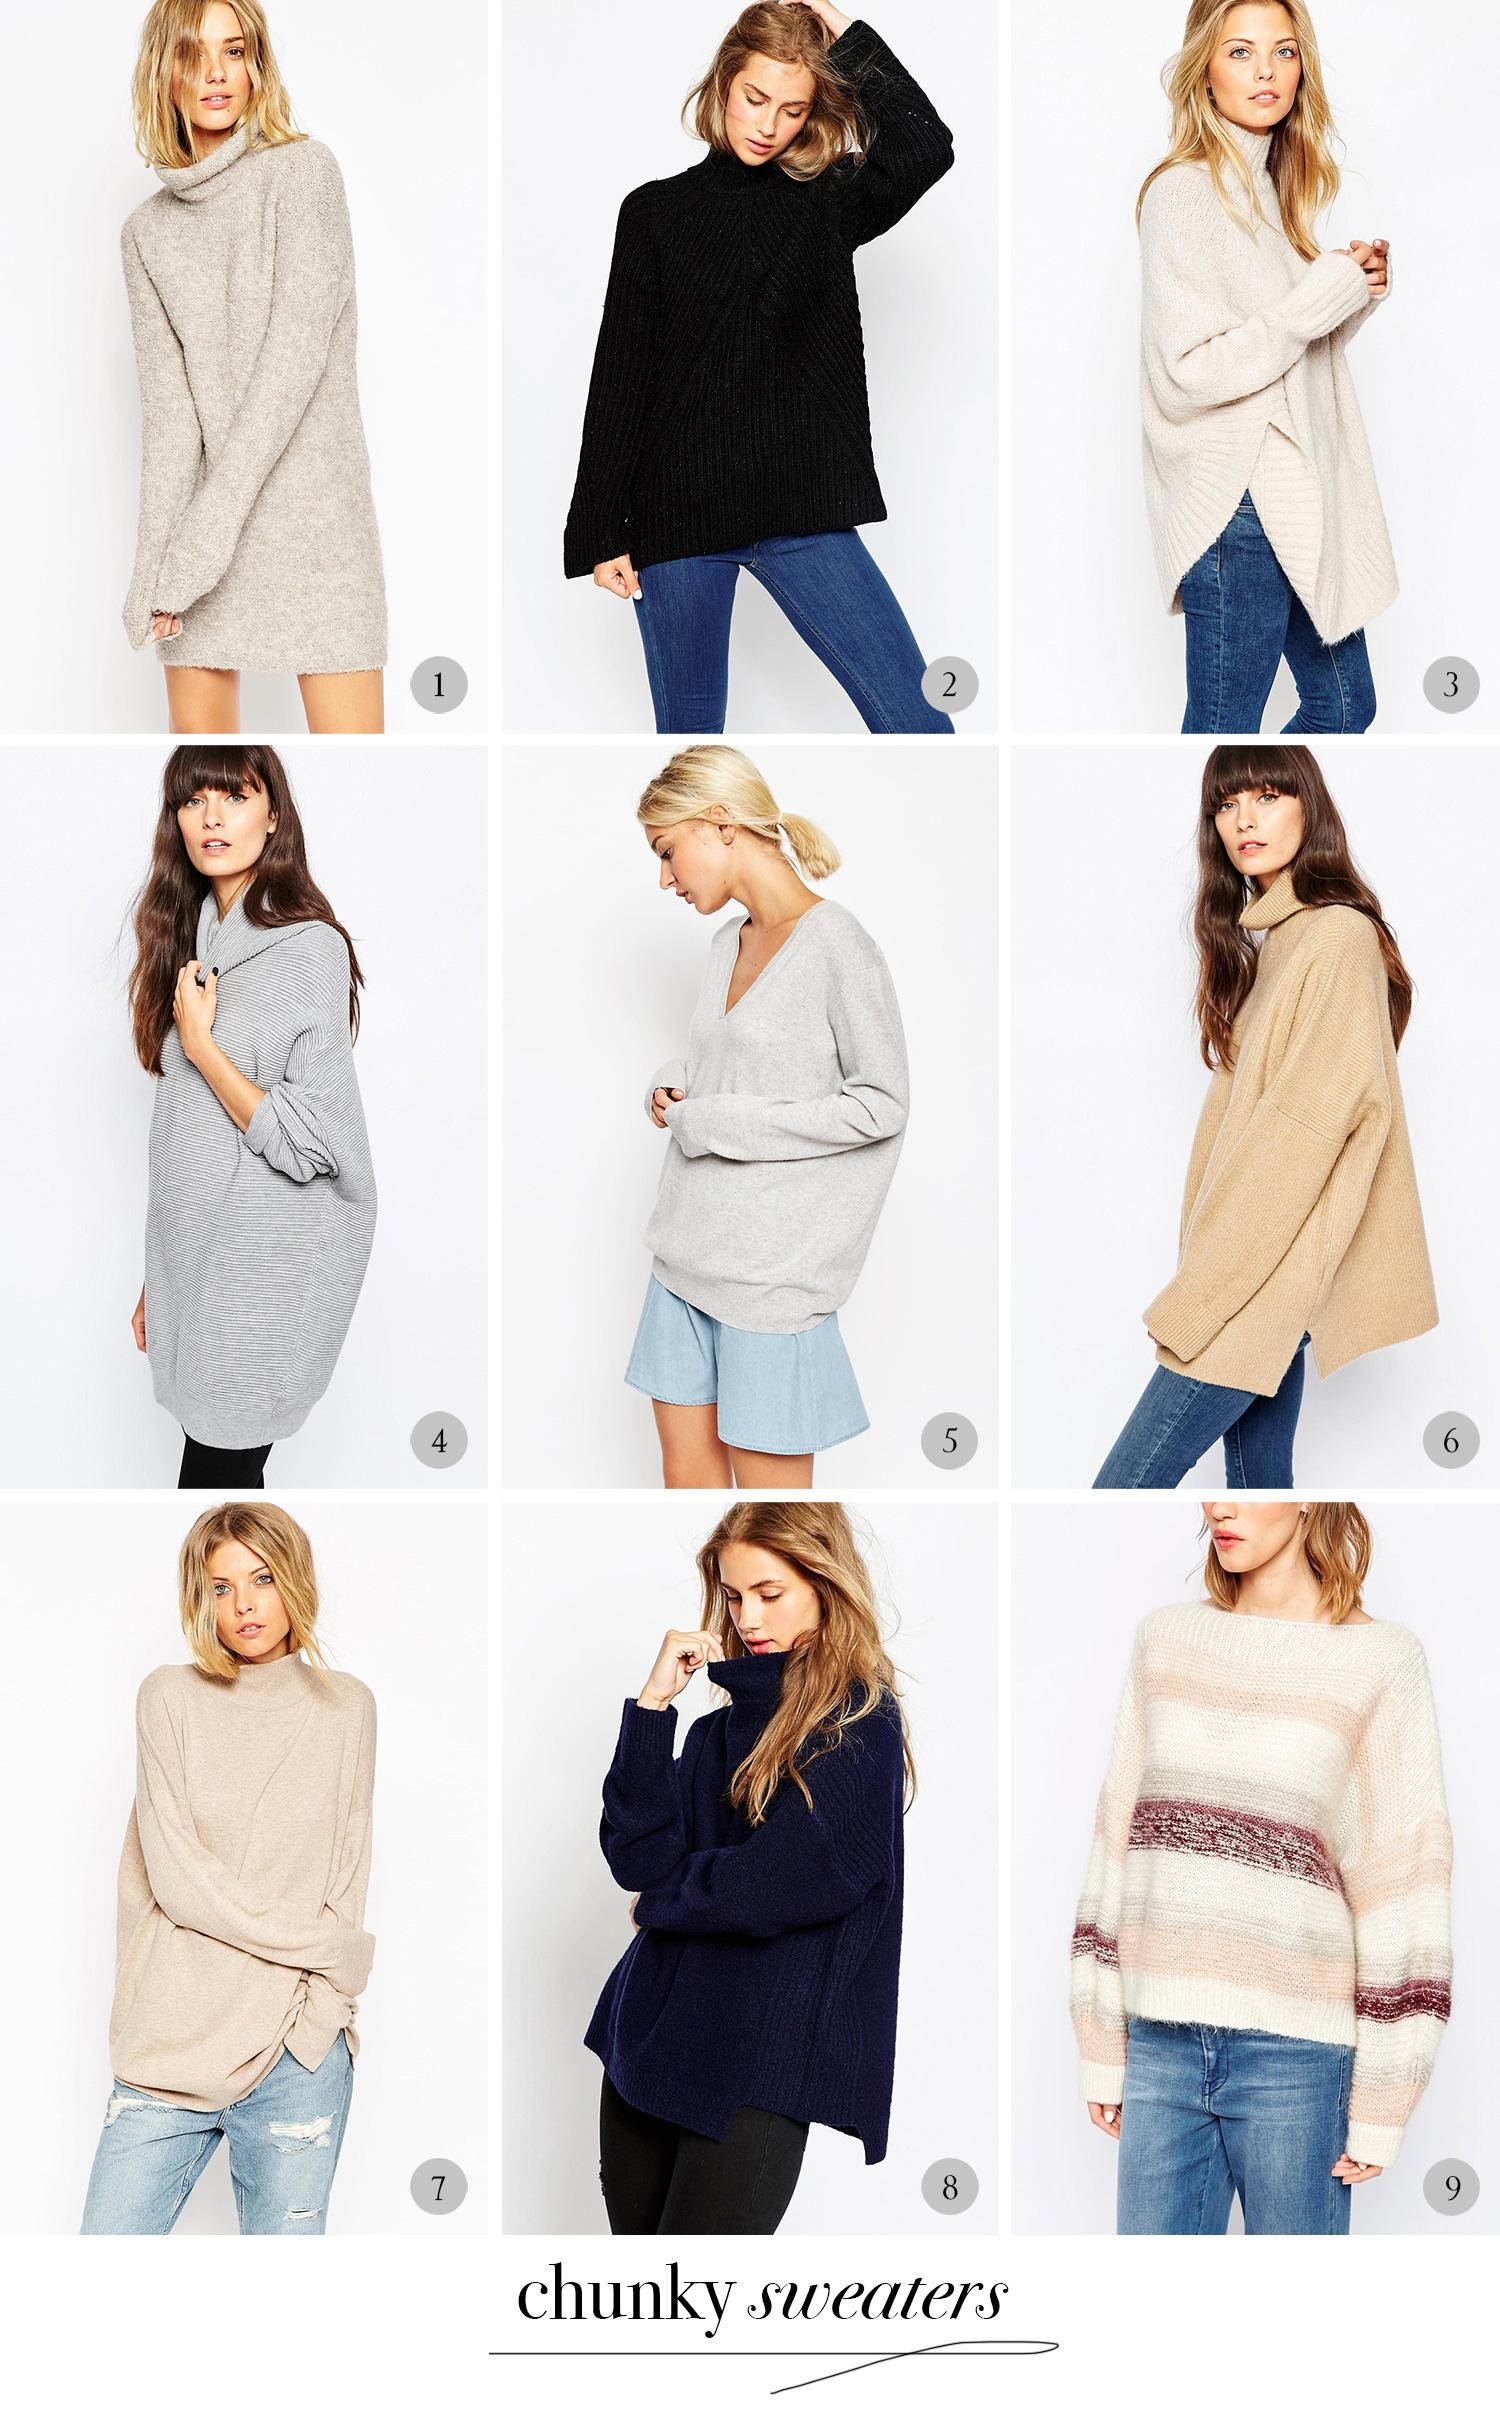 striktrøjer-sweater@2x